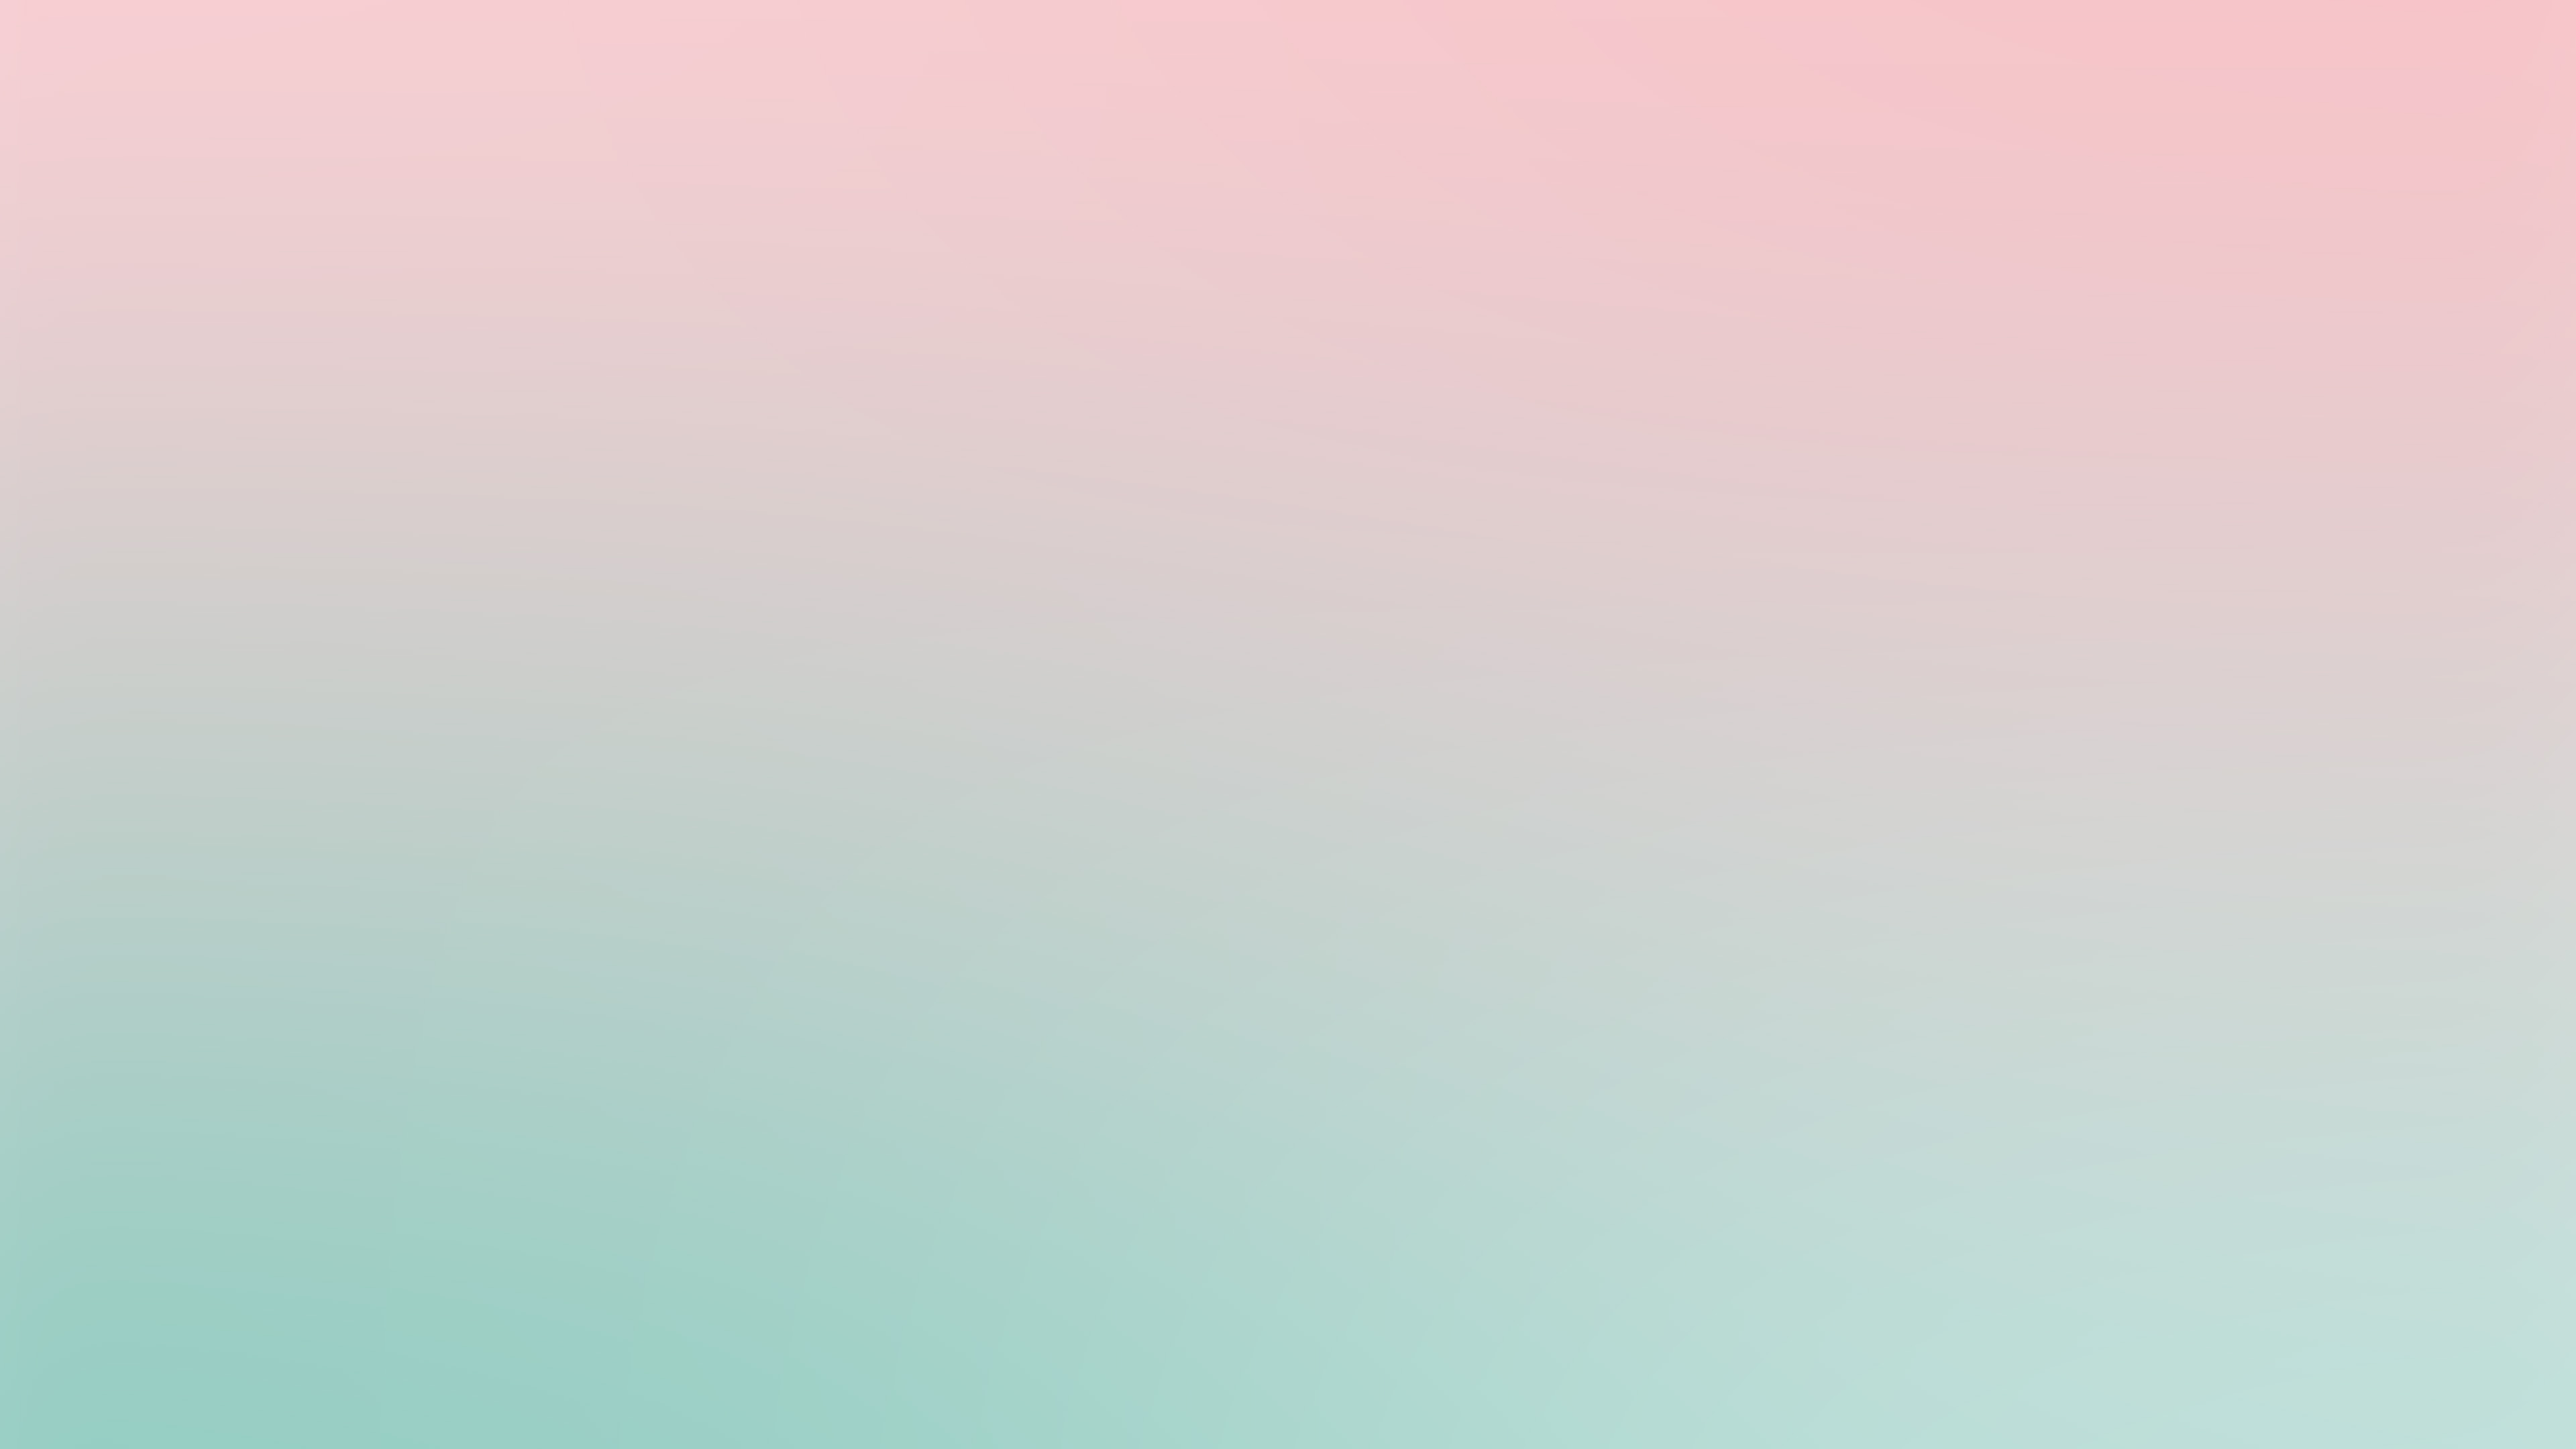 3840 x 2400 - Pastel pink wallpaper hd ...